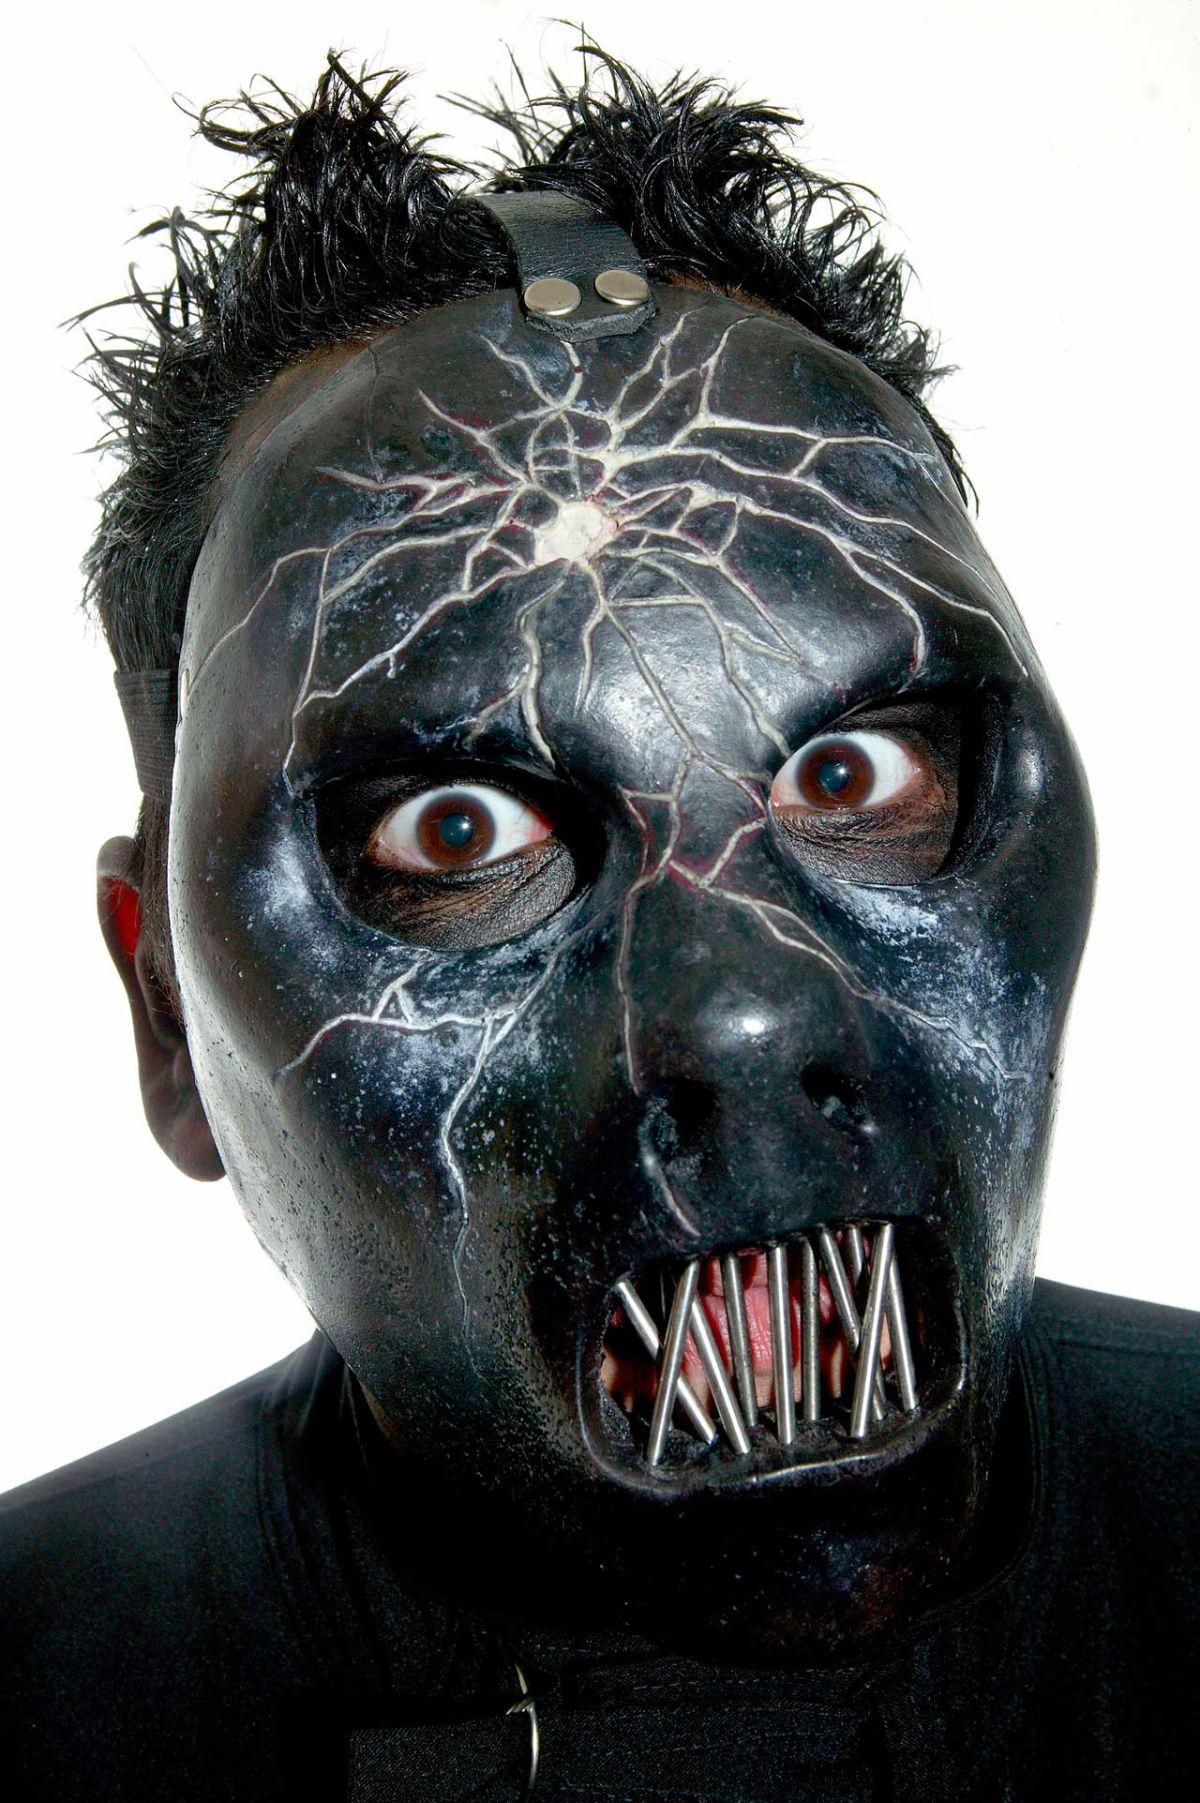 Paul Grey mask RIP Slipknot mask Latest mask Hard Rock Slipknot mask Halloween